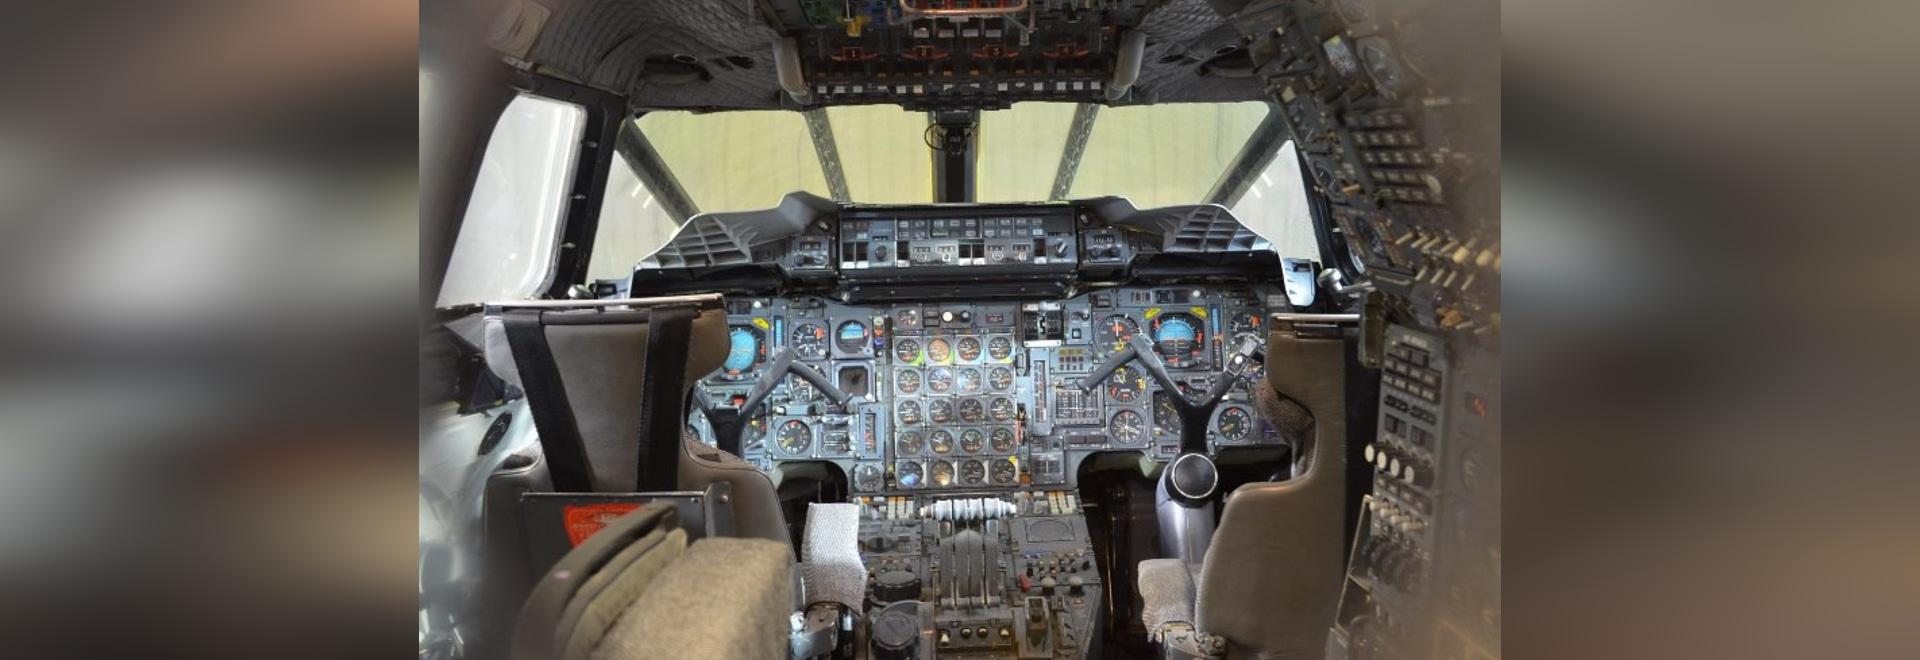 Honeywell develops blockchain-based platform for aviation sector